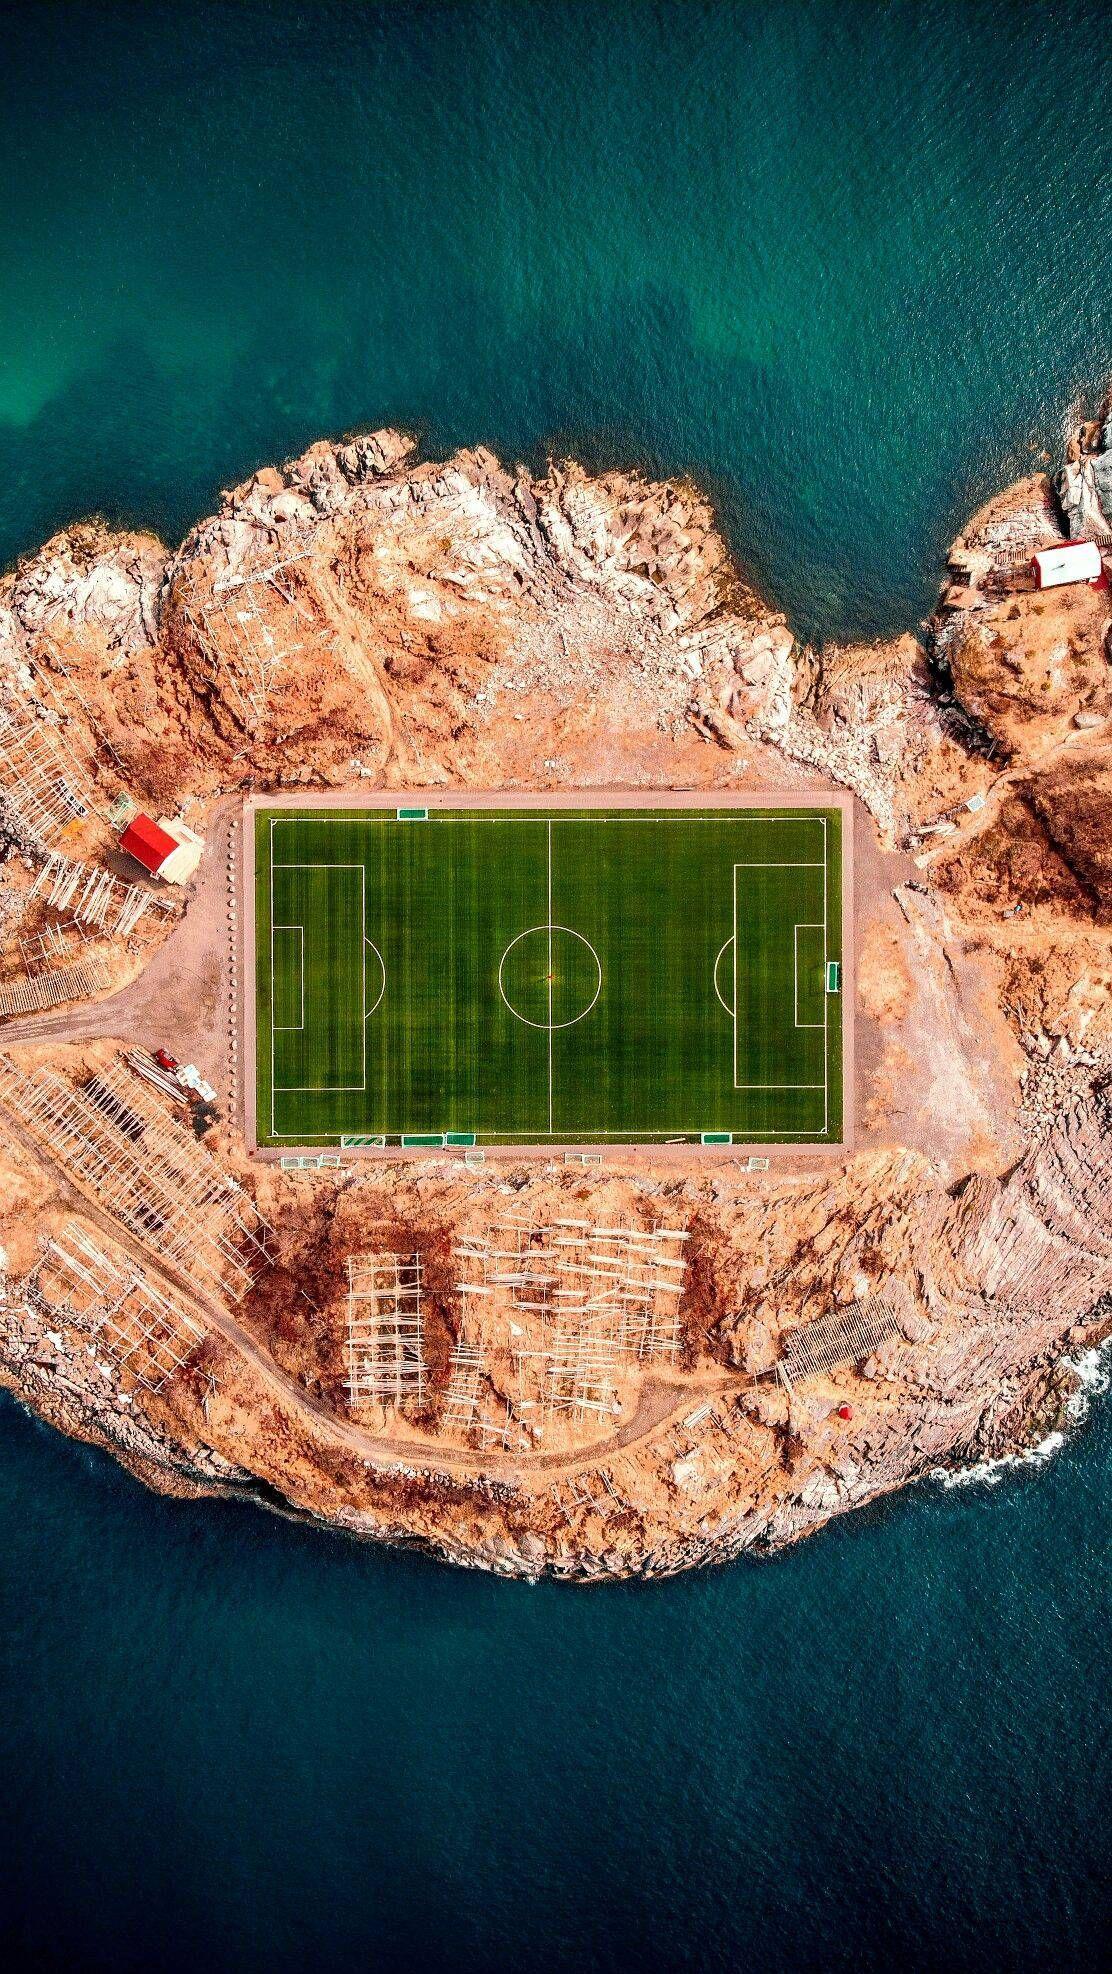 Football Stadium In Henningsvaer Iphone Wallpaper Iphone Wallpapers Photo Drone Photography Aerial Photography